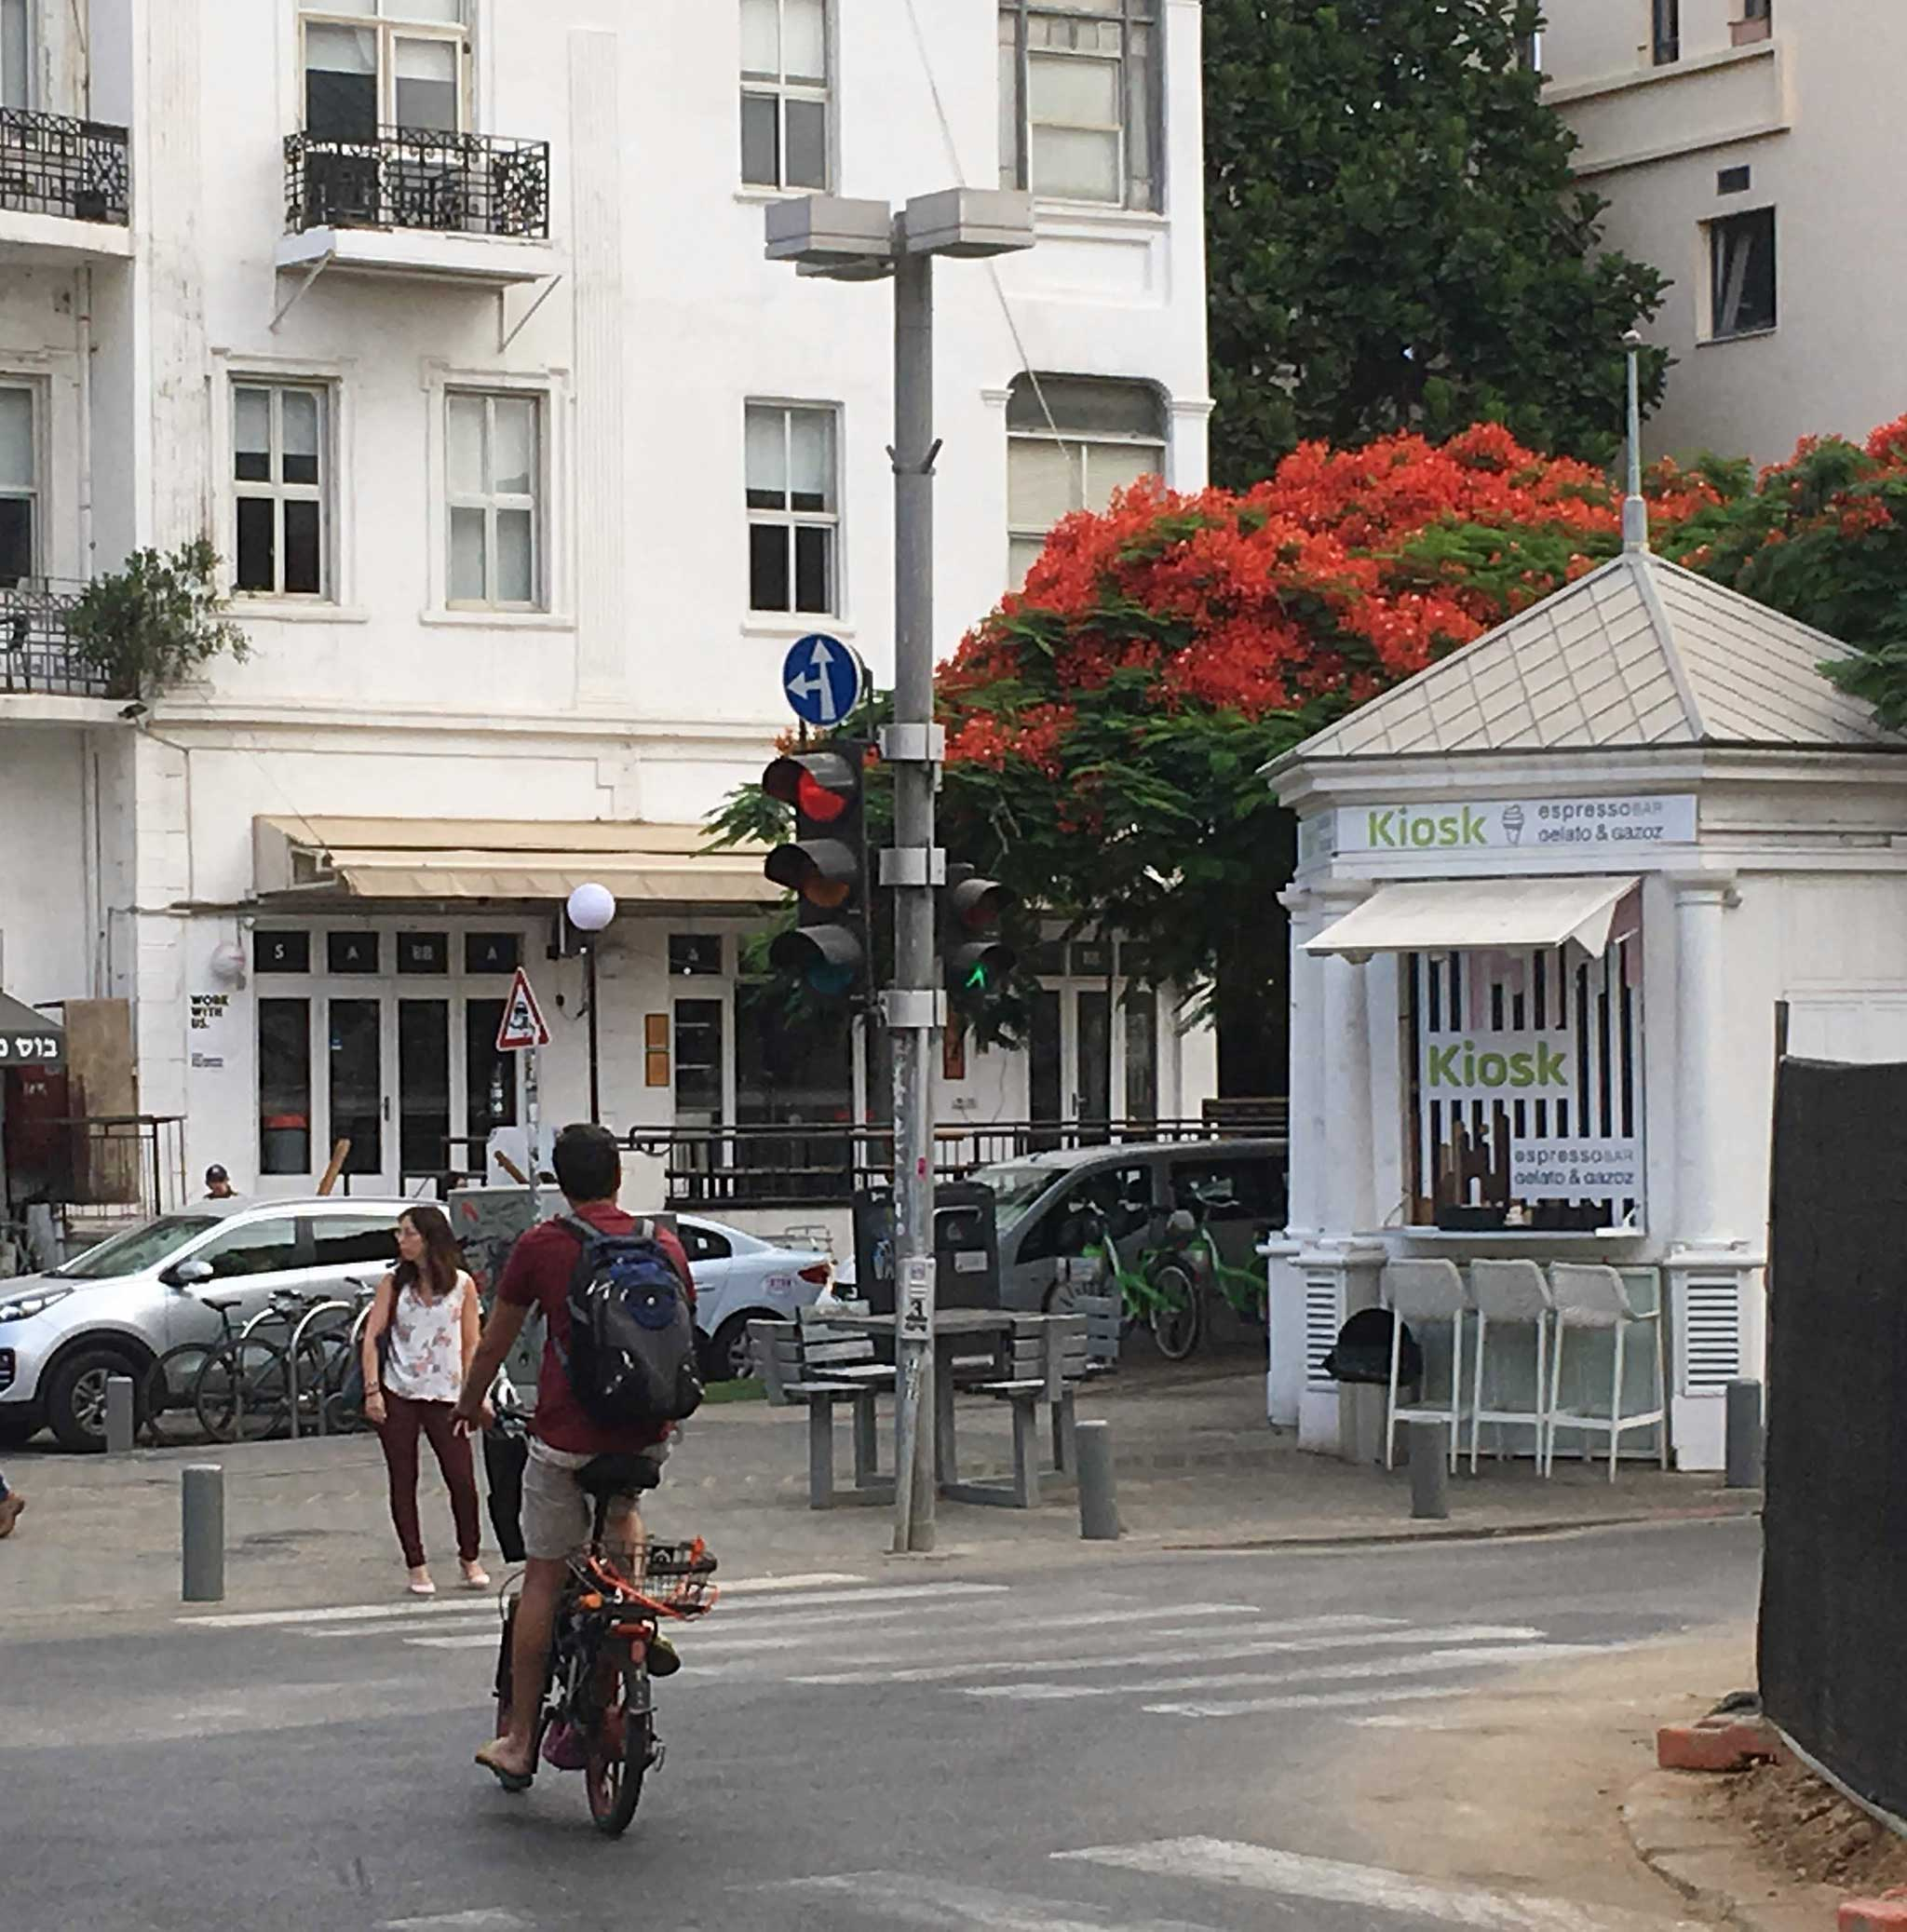 Cross Herzl St on Tel Aviv audio tour The Trail of Independence: Tracing the origins of modern Tel Aviv